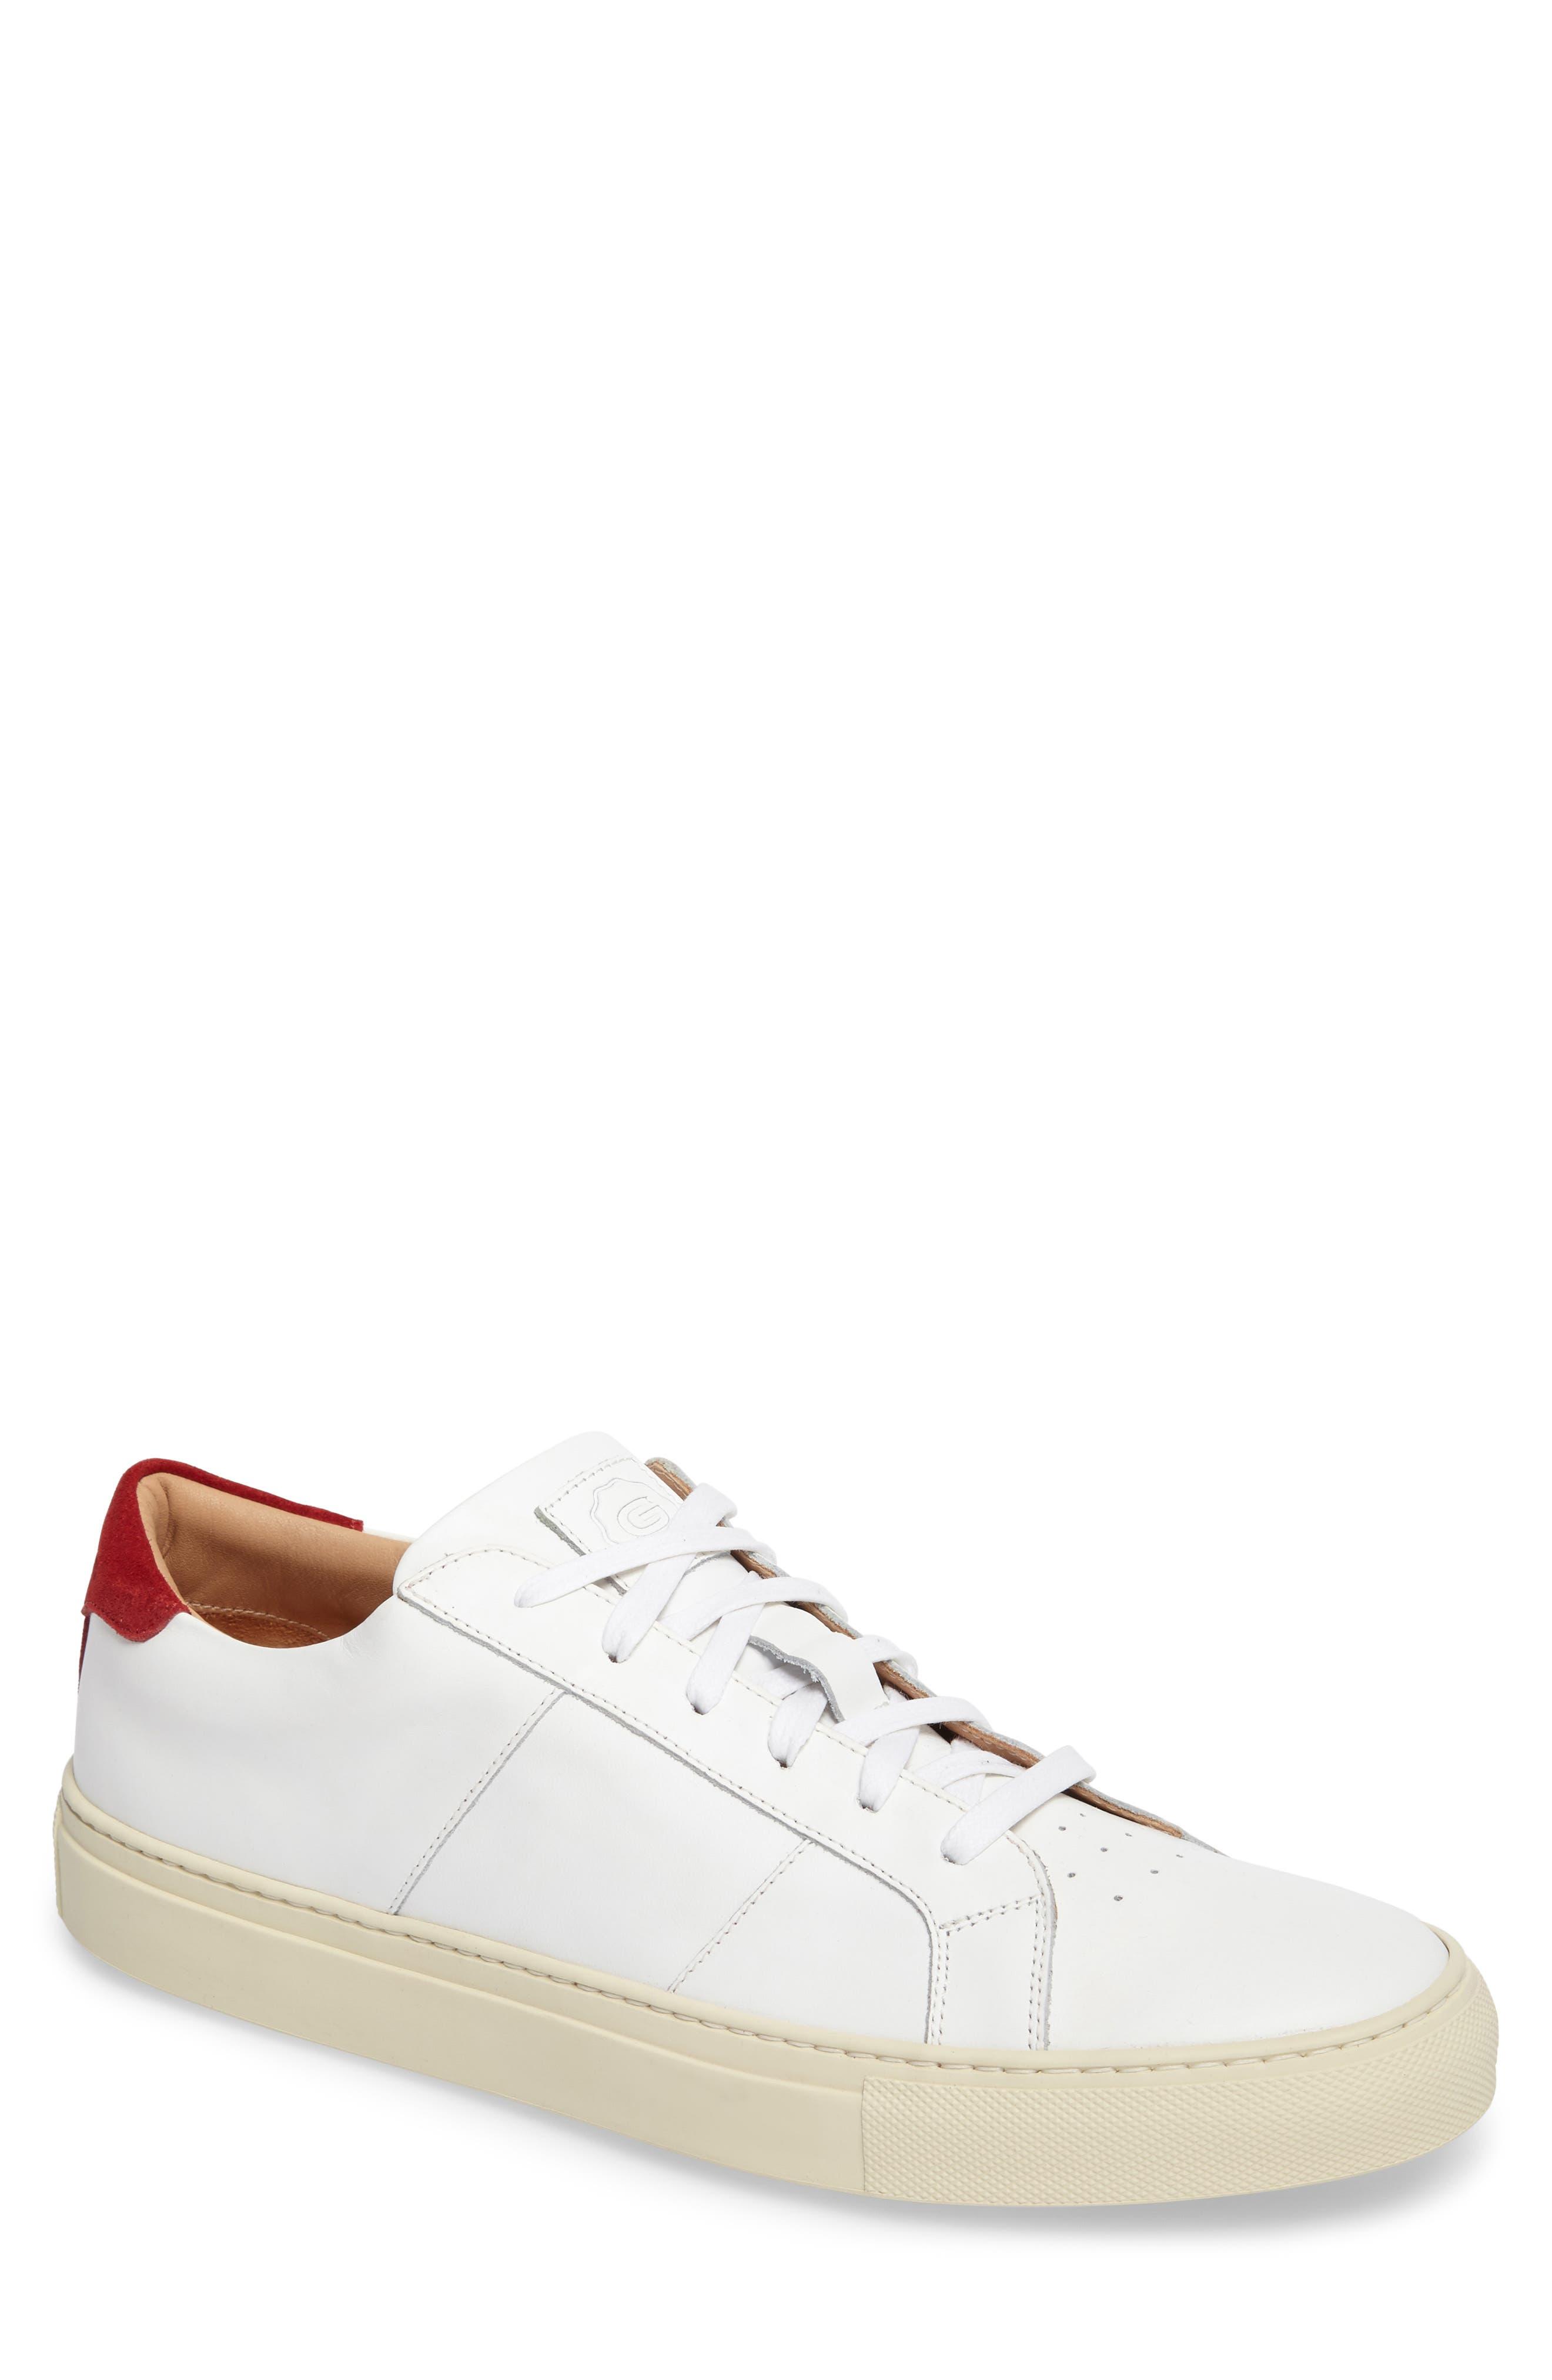 Main Image - Greats Royale Vintage Low Top Sneaker (Men) (Nordstrom Exclusive)